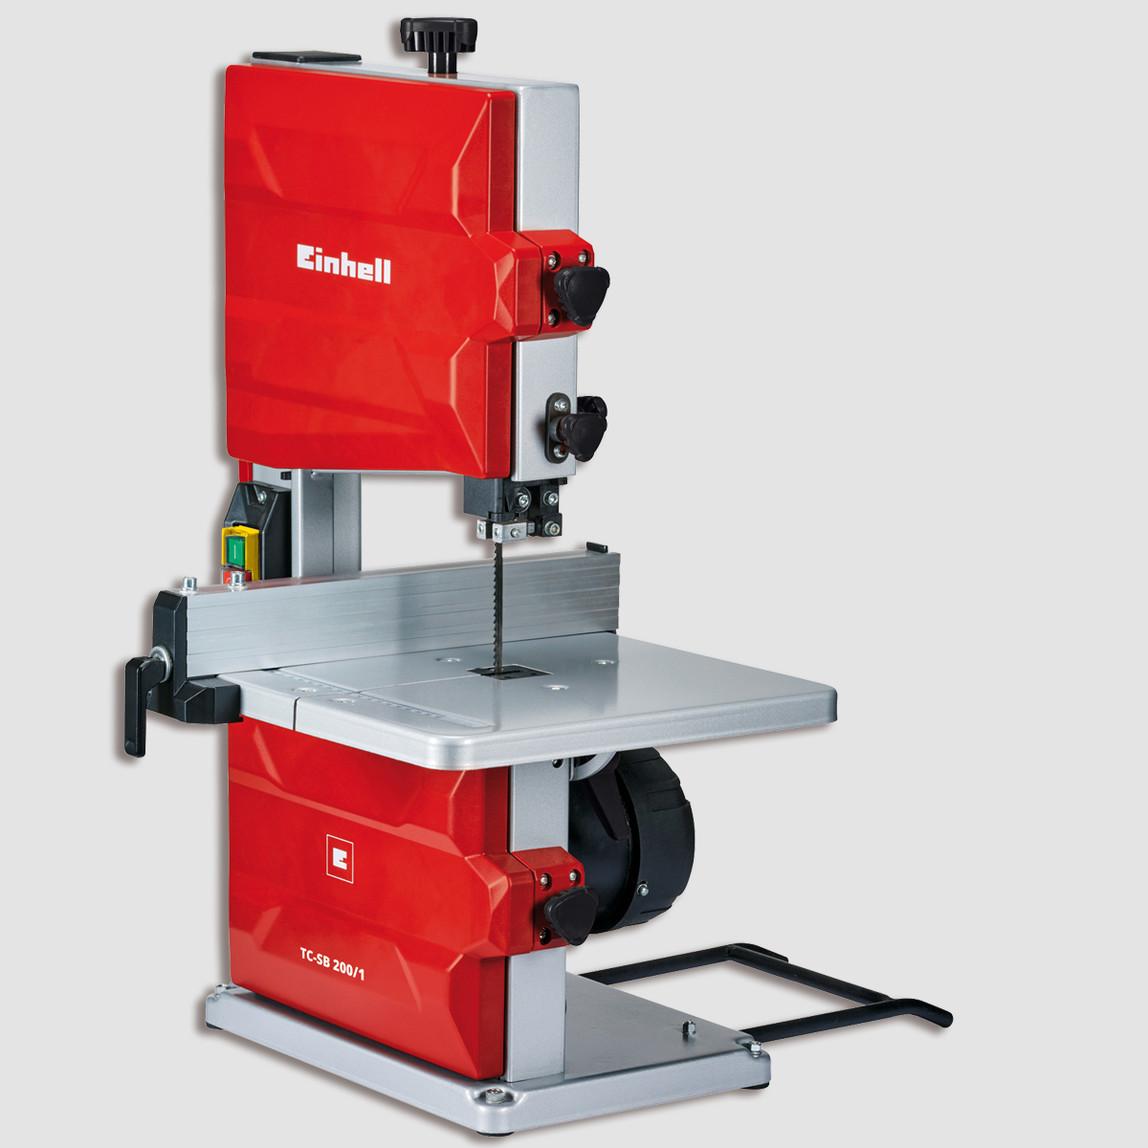 Einhell Şerit Testere 250W TC-SB2001